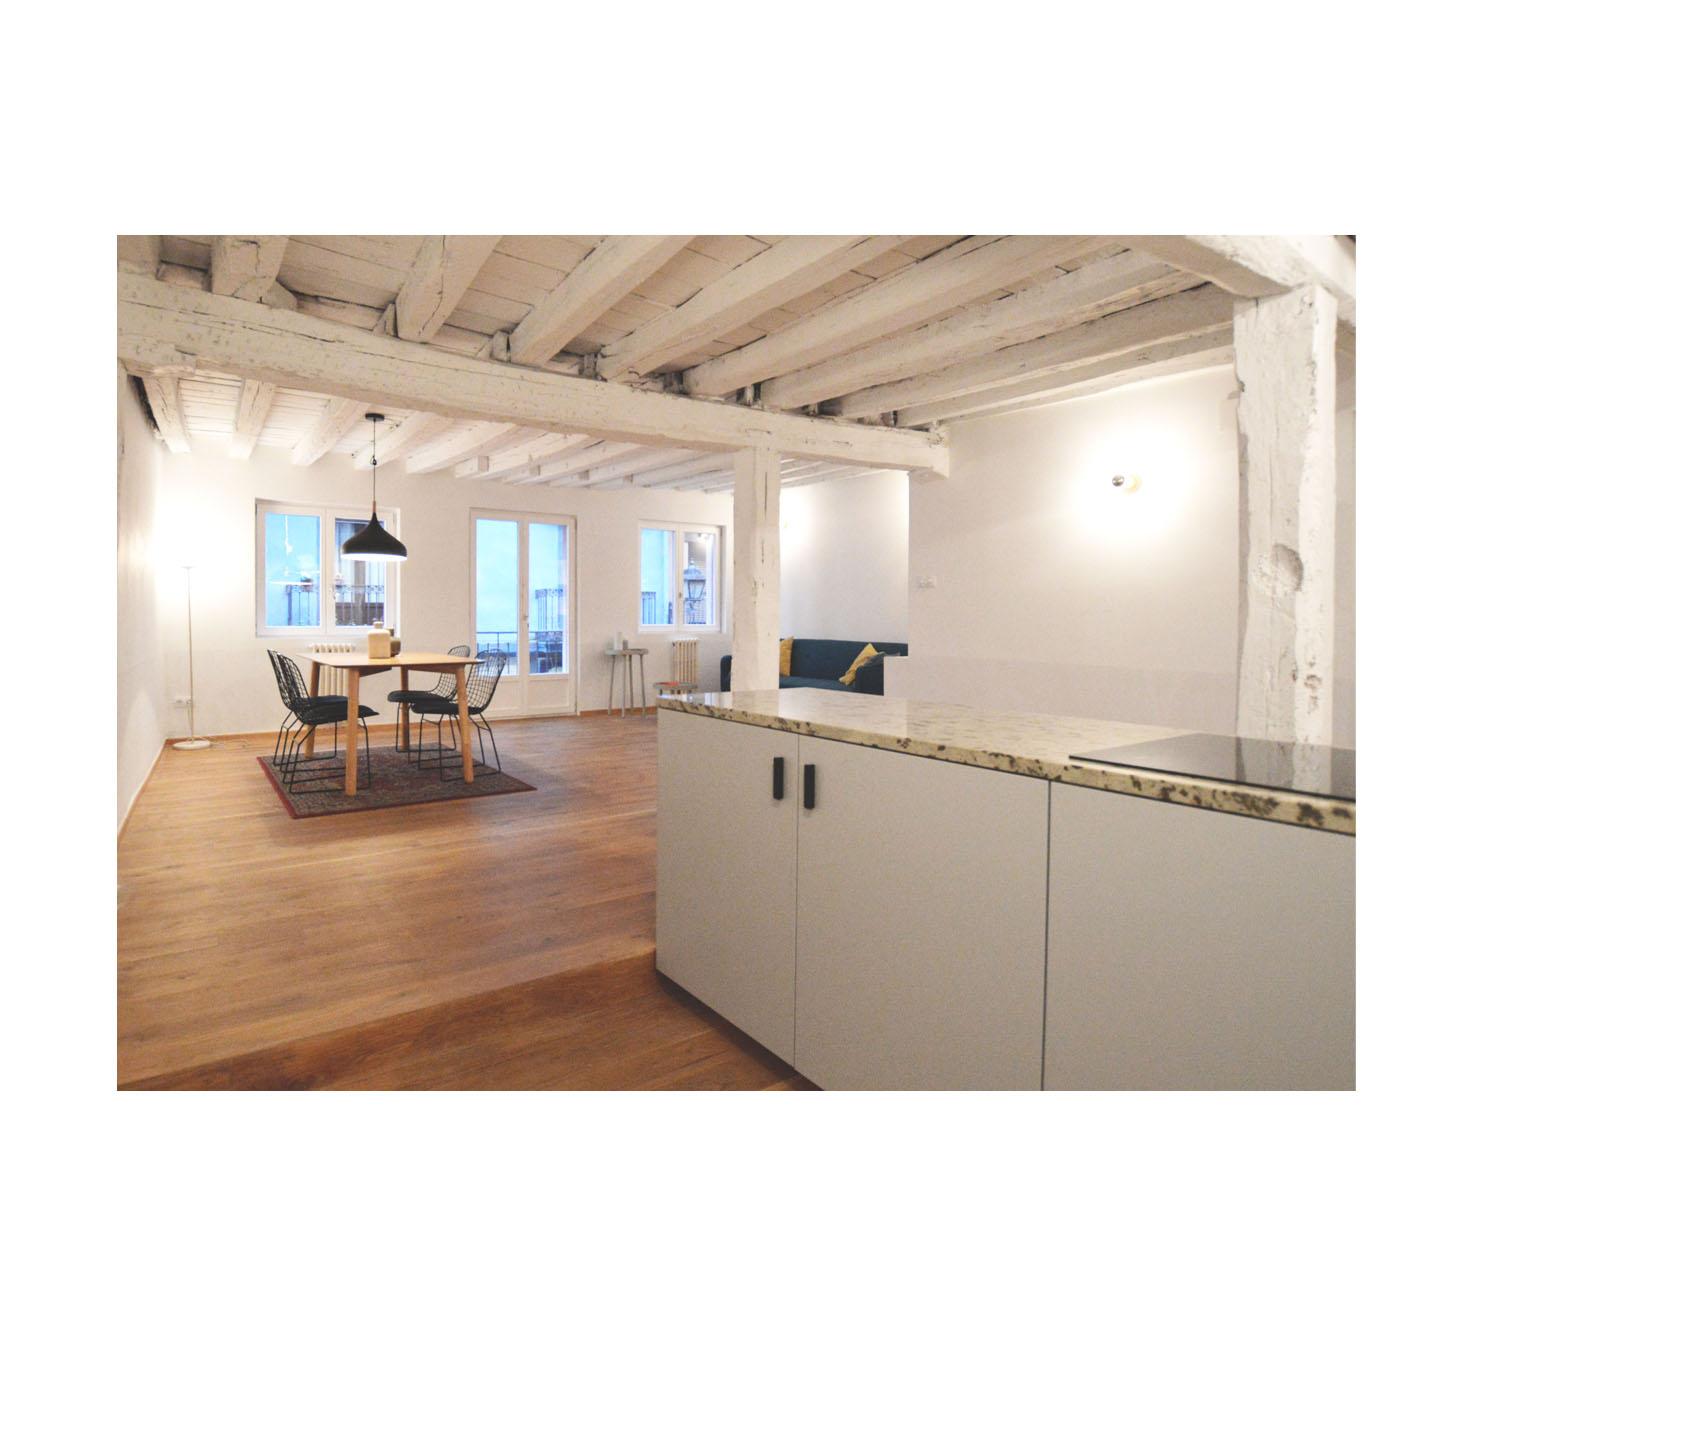 Apartment Artekale-Bilbao-Image 03.jpg